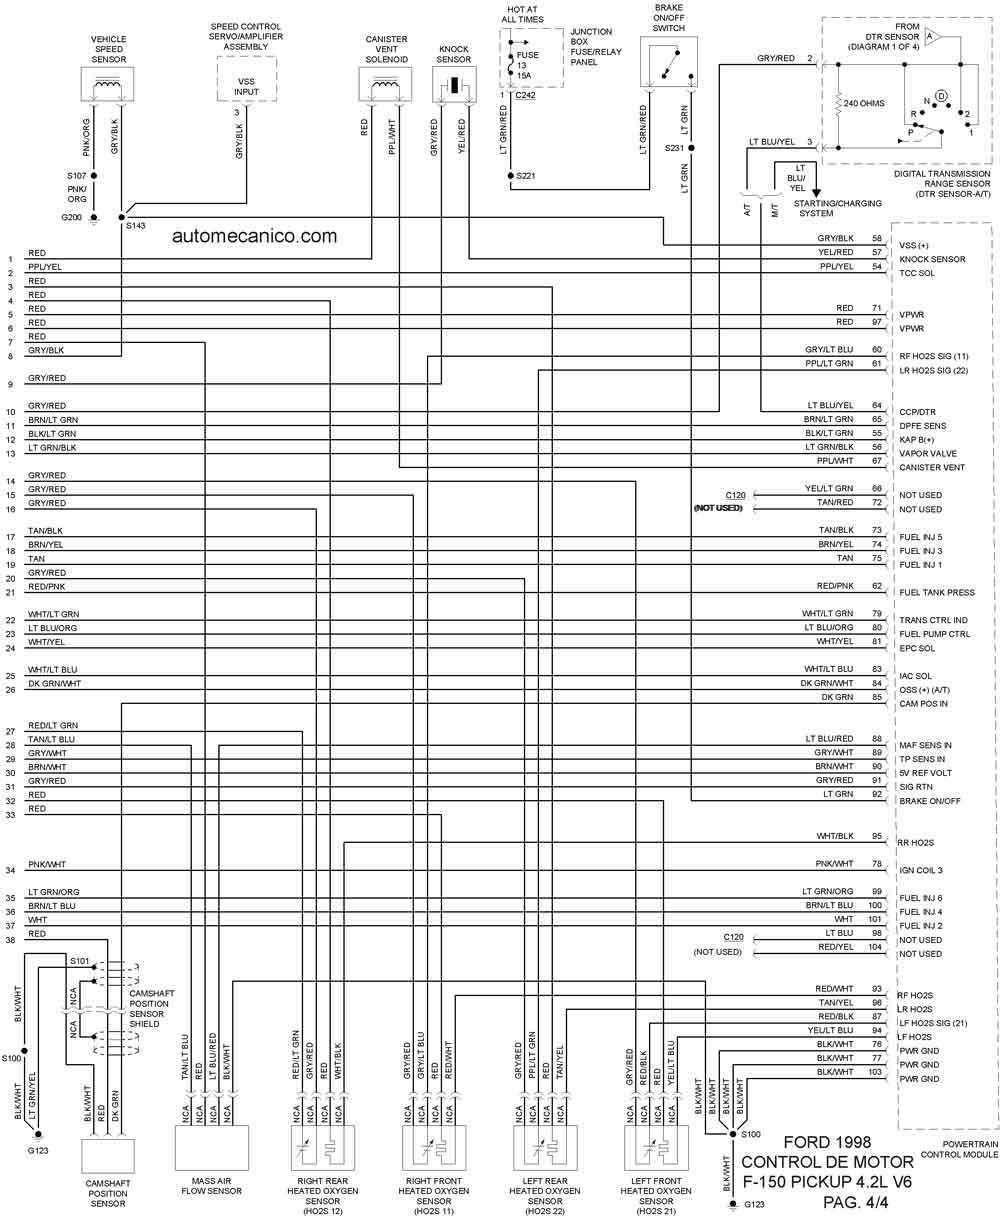 1999 malibu diagrama del motor